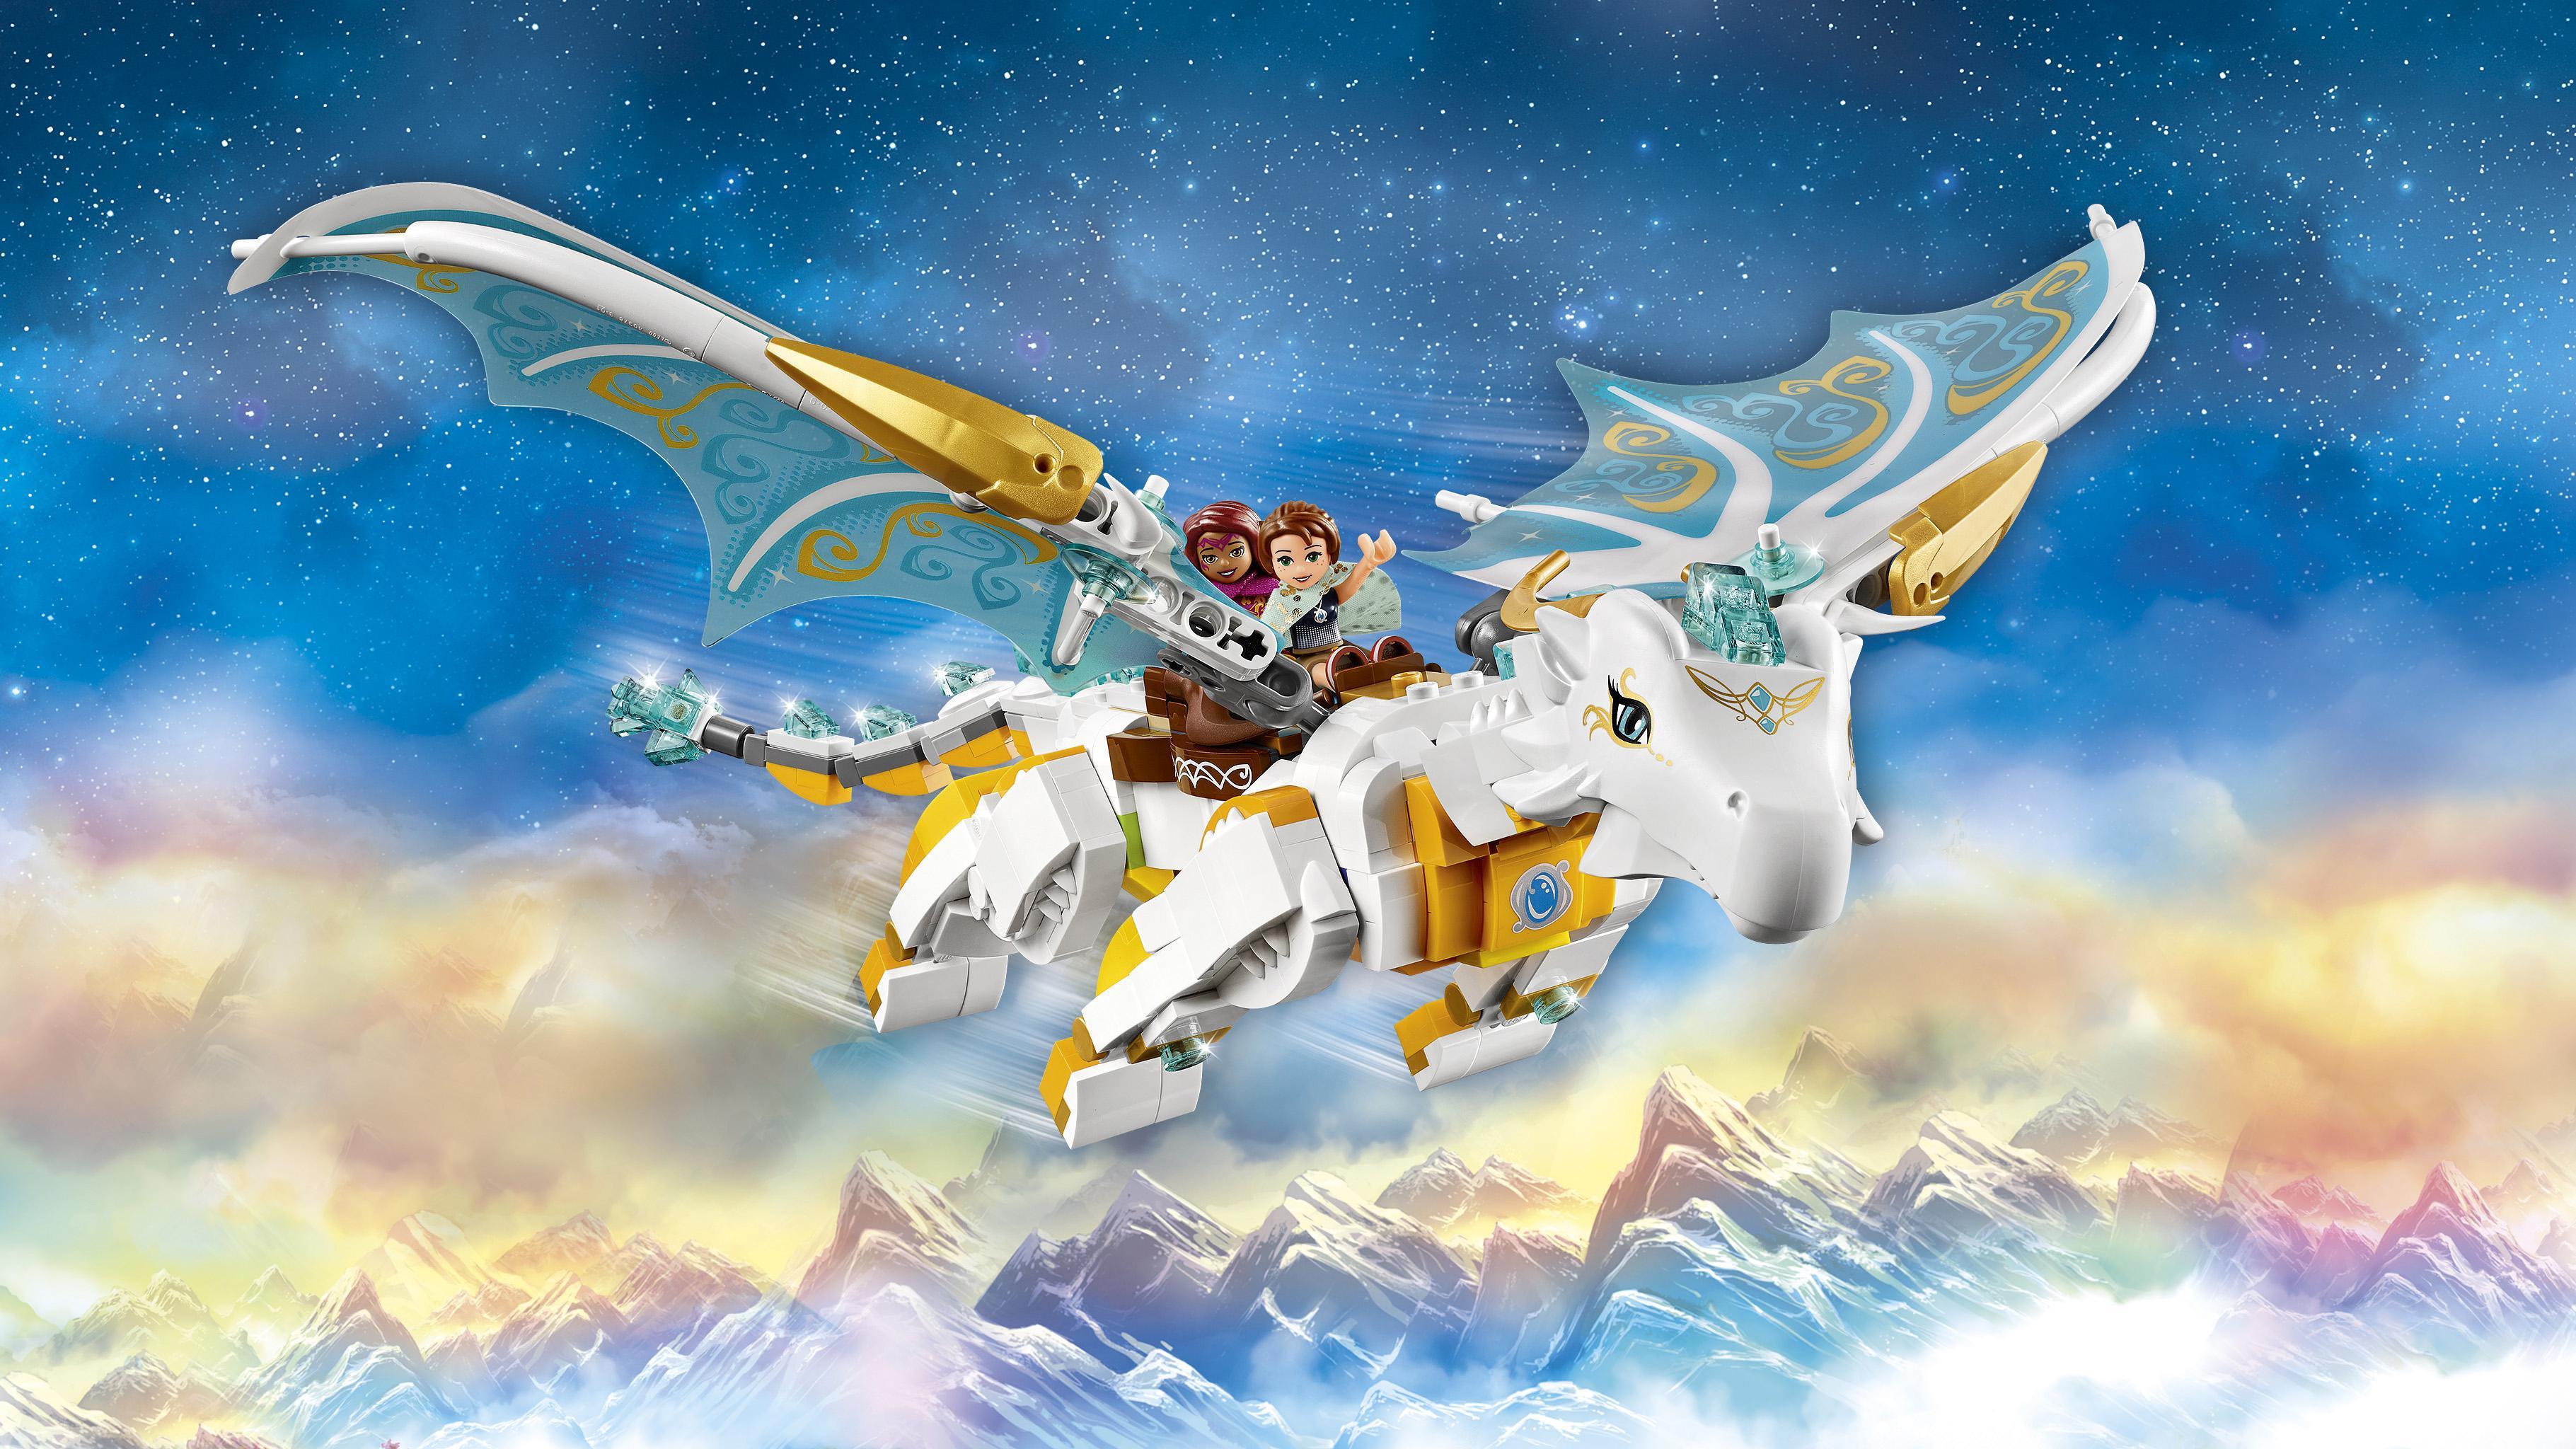 lego elves 41179 queen dragon 39 s rescue building kit 833